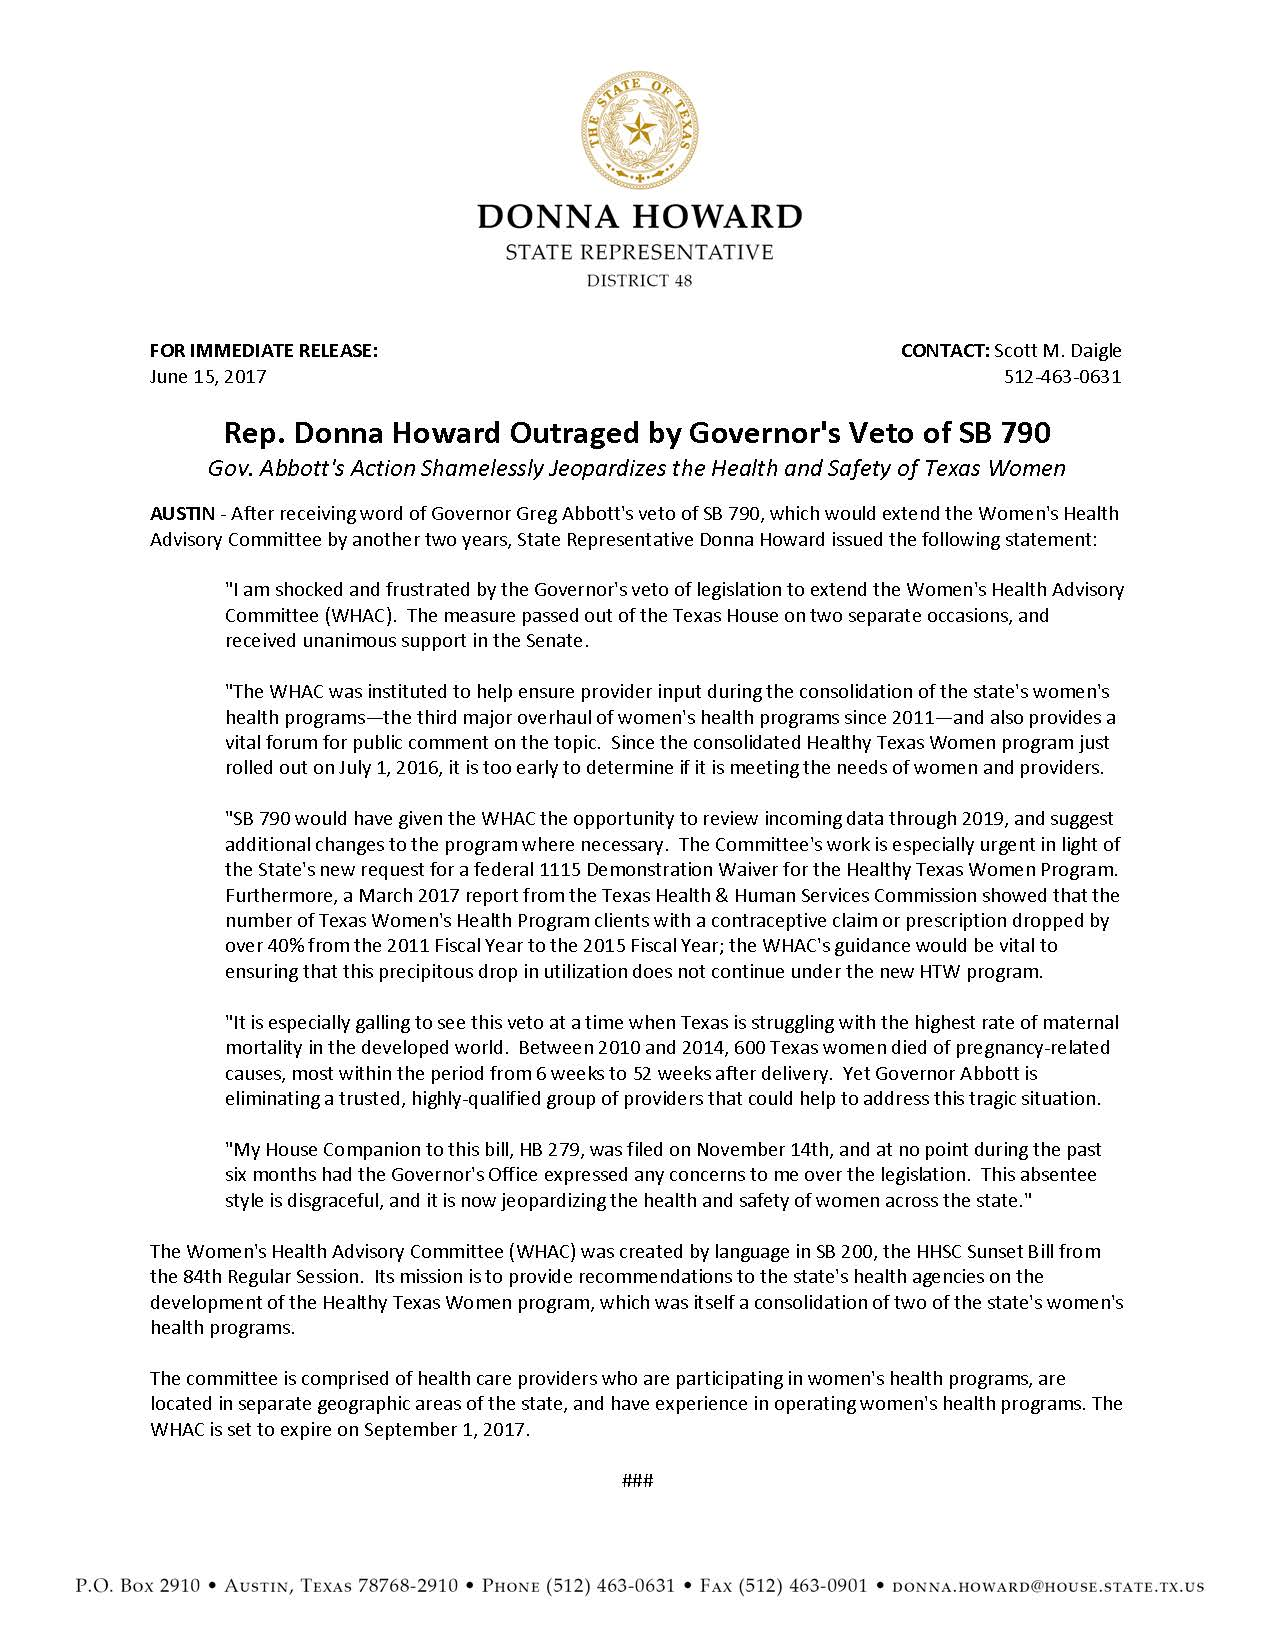 Rep. Donna Howard_Statement on Governor's Veto of SB 790_06.15.2017.jpg